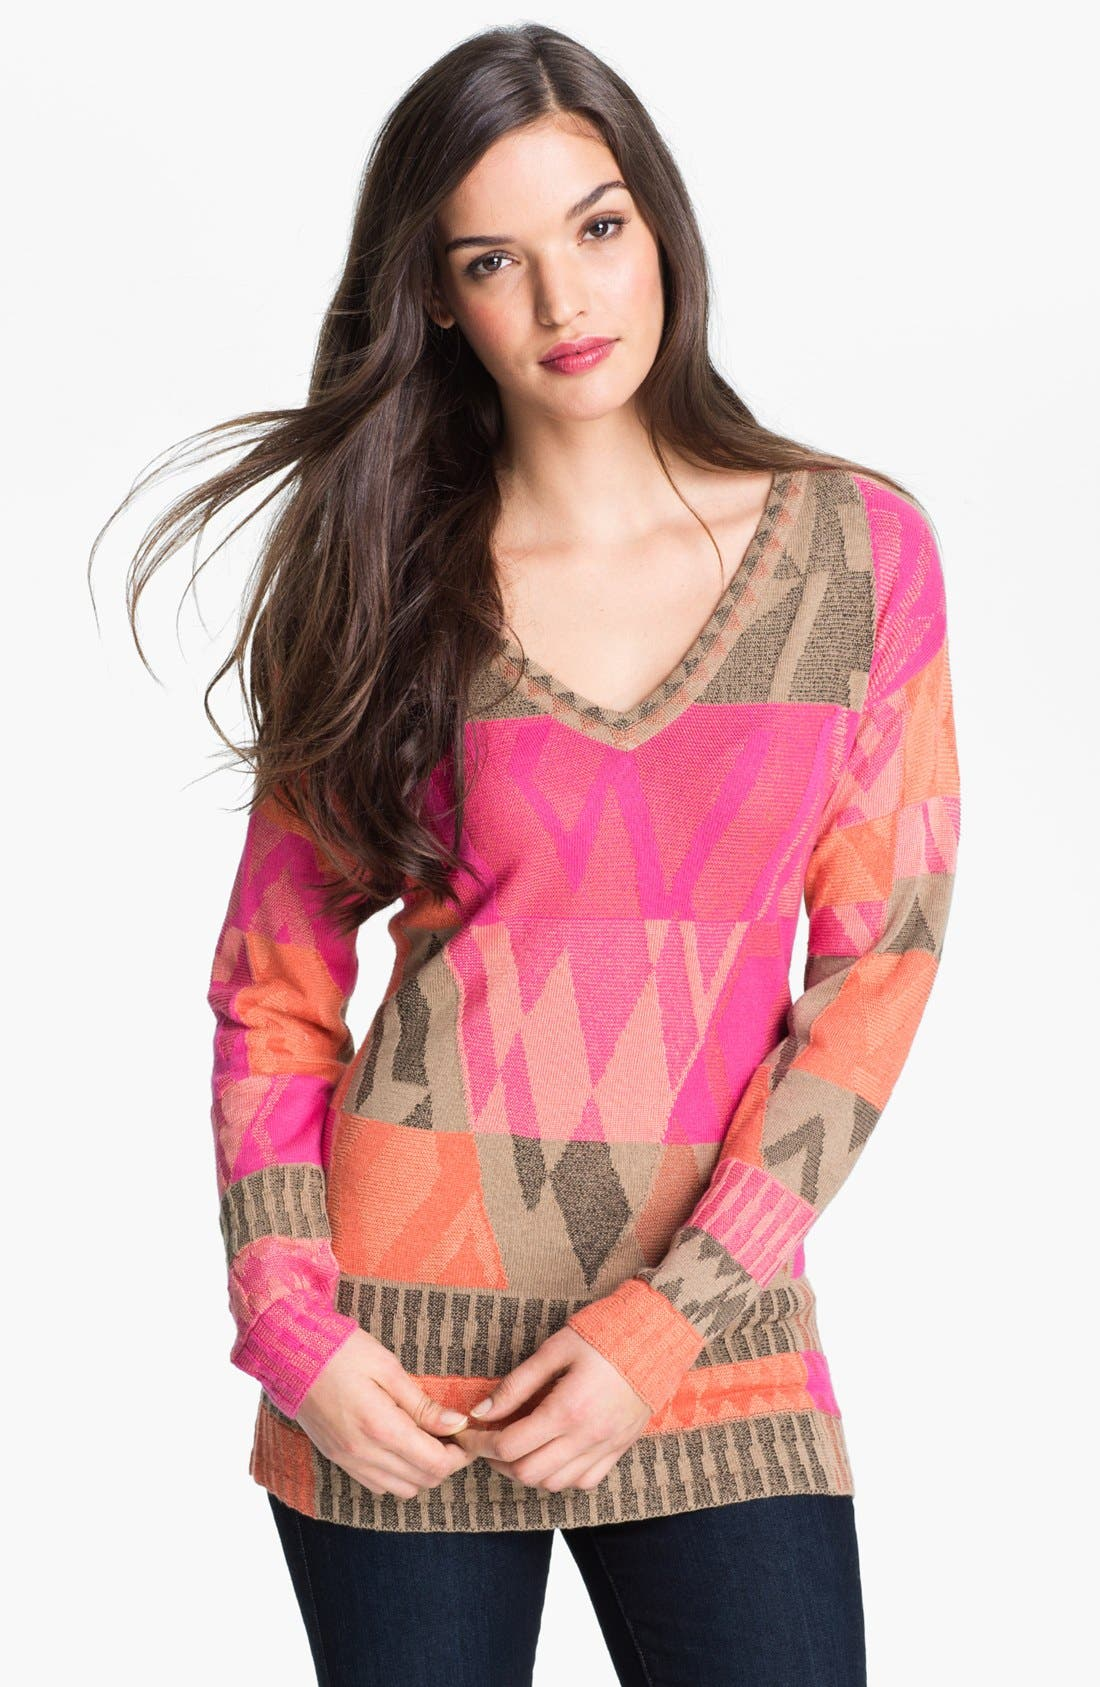 Alternate Image 1 Selected - Nic + Zoe 'Coral Reef' Sweater (Petite)